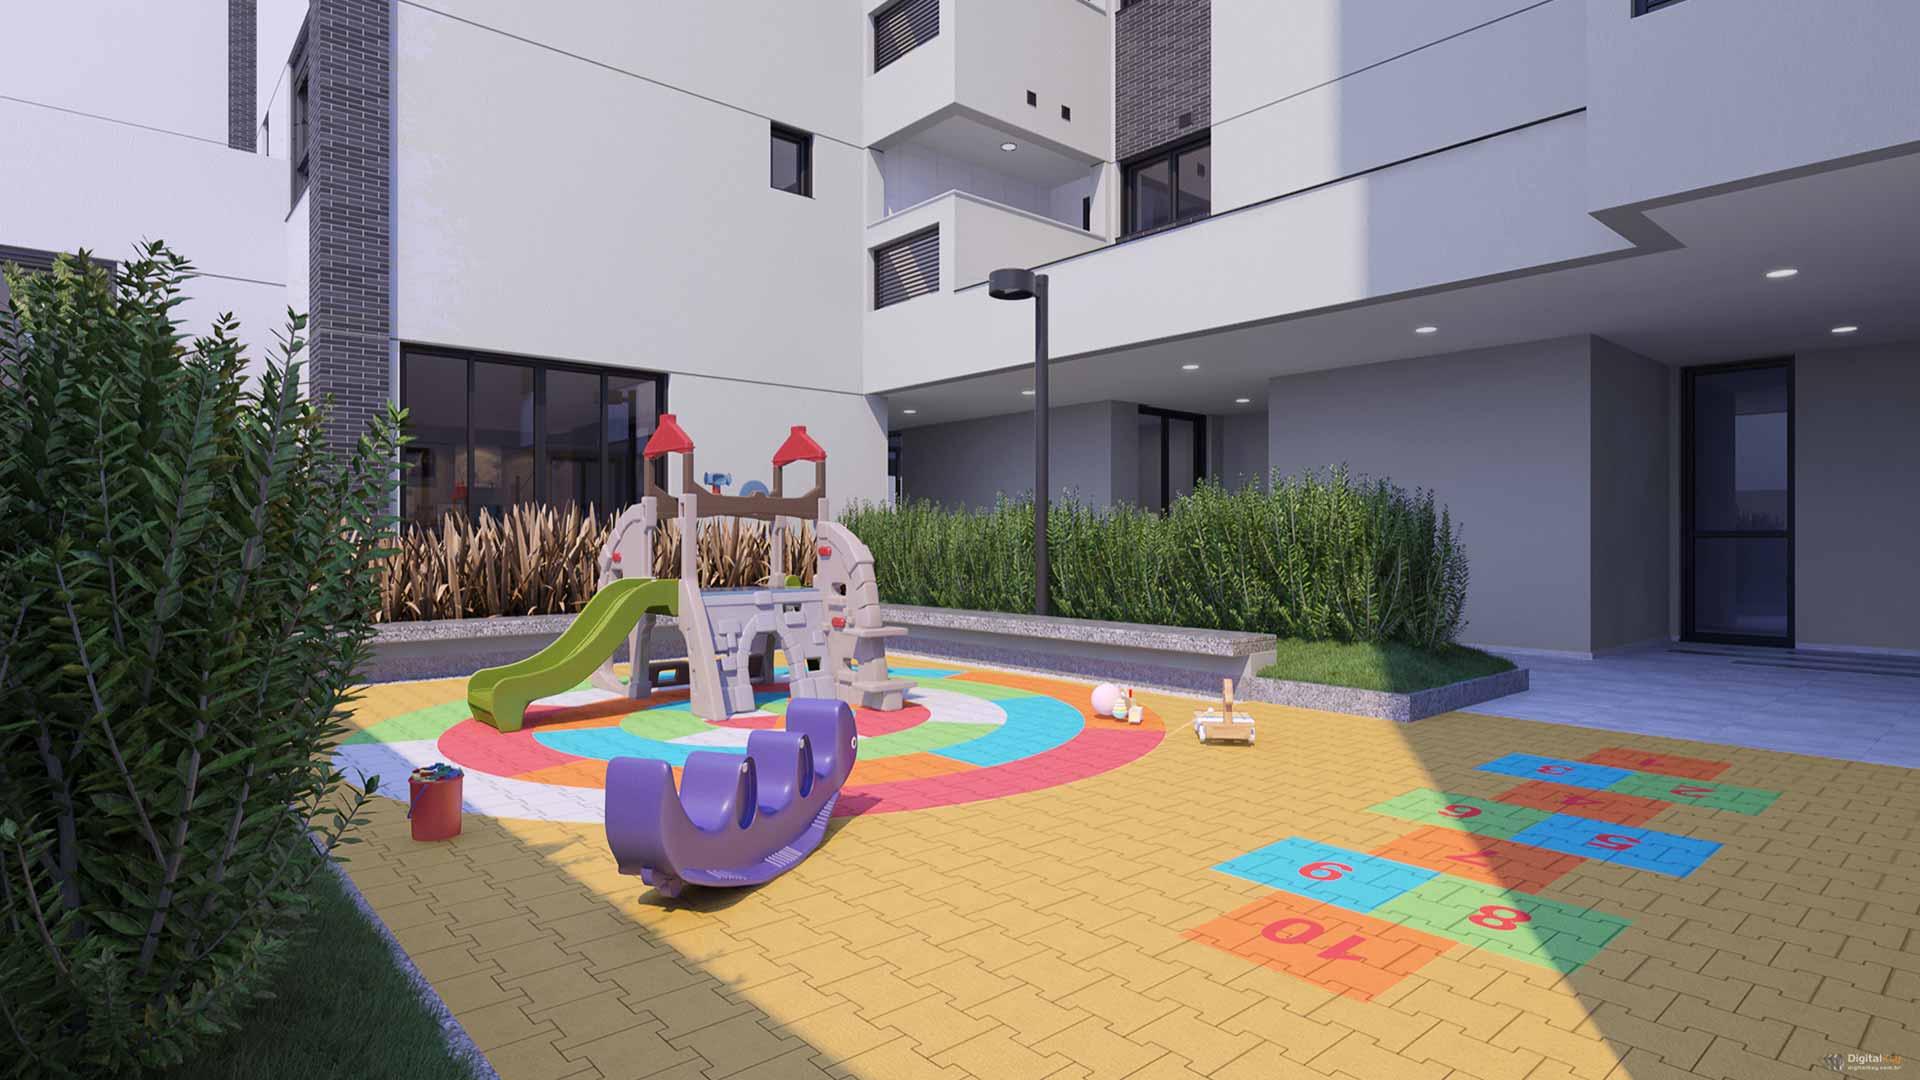 Playground Perspectiva Ilustrada